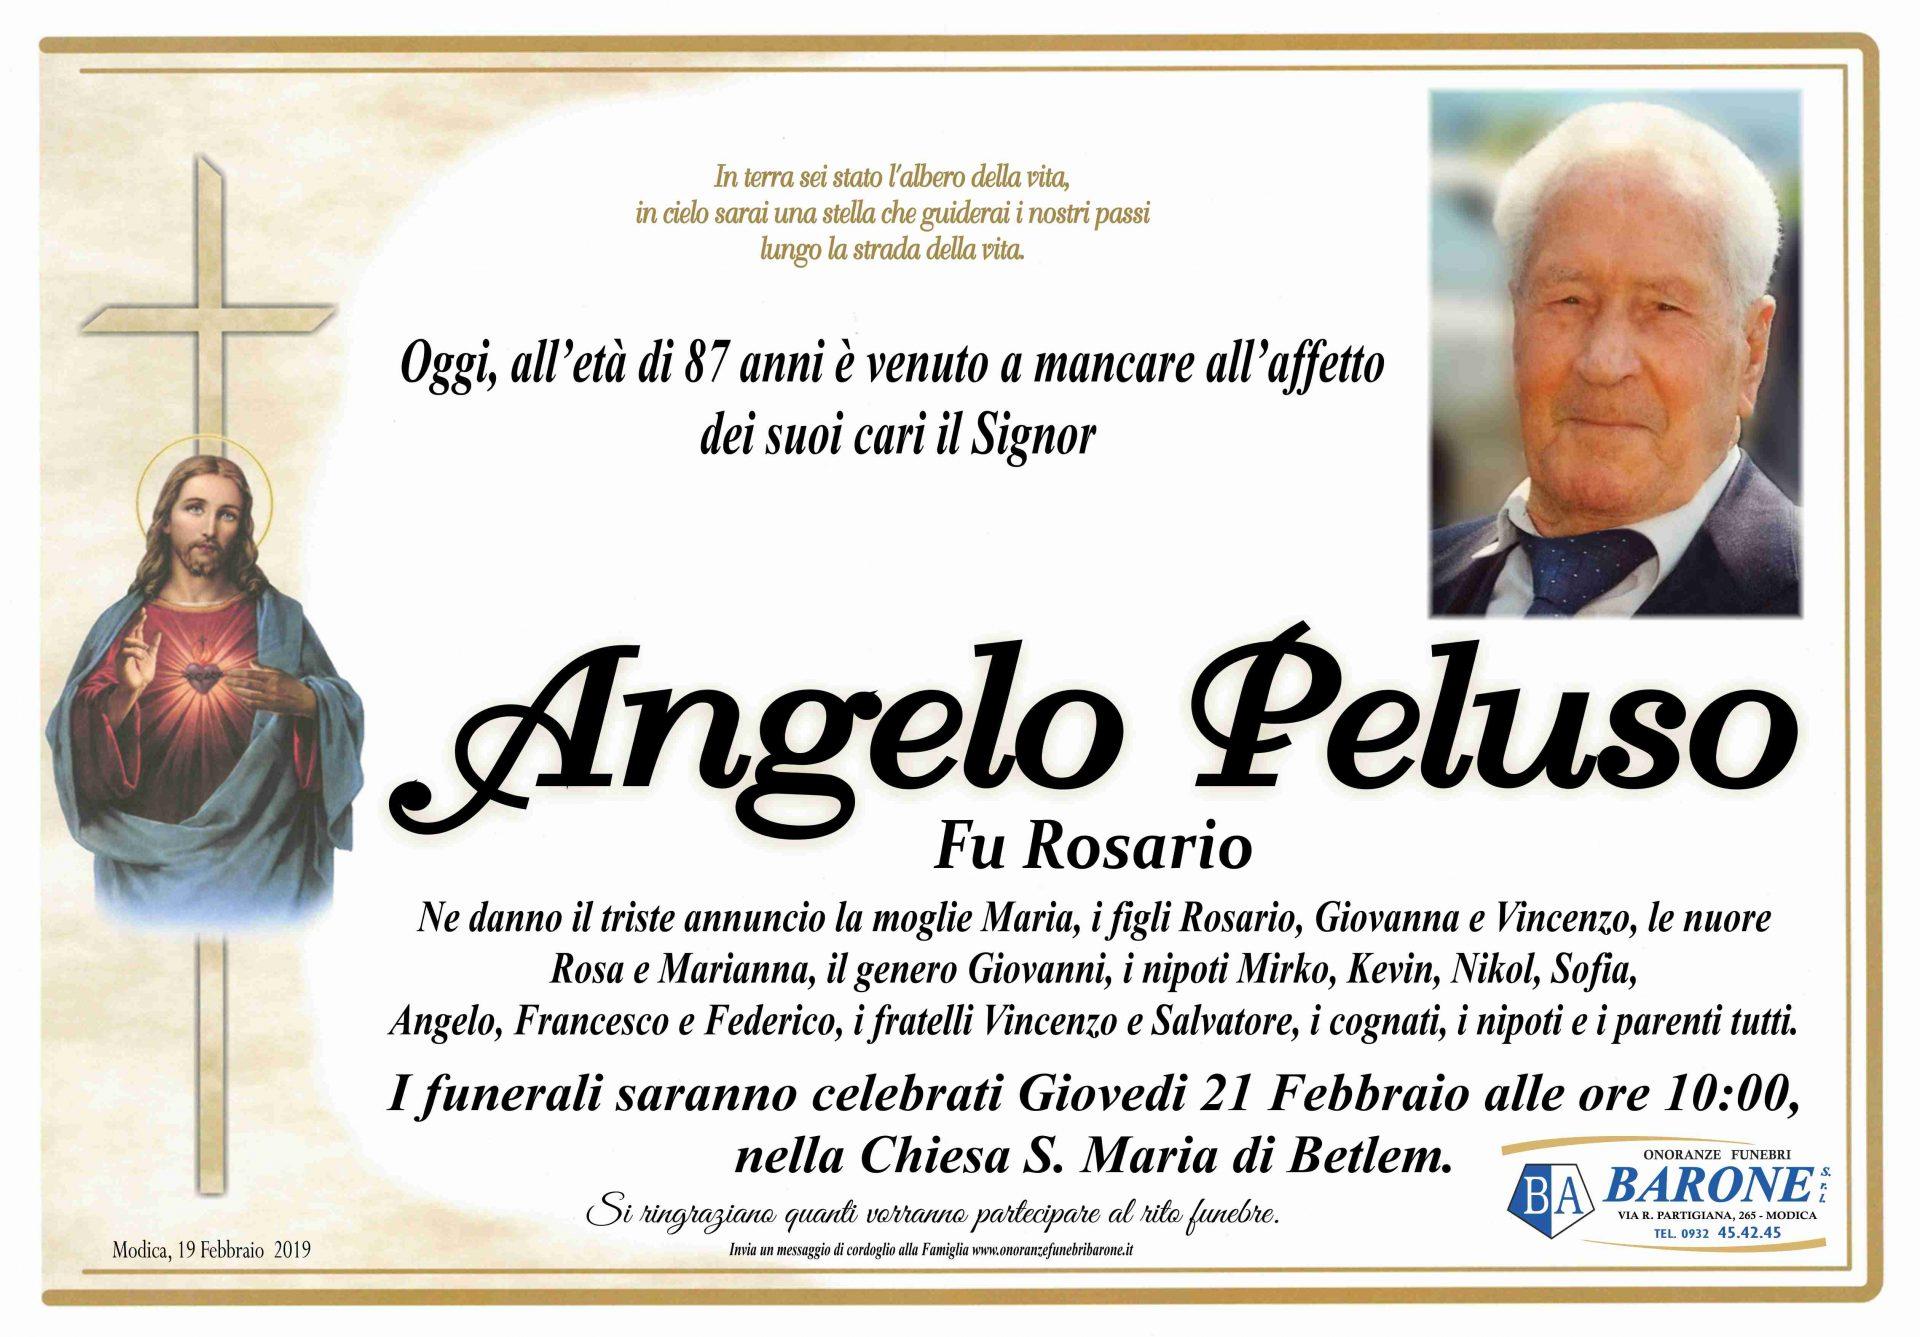 Angelo Peluso